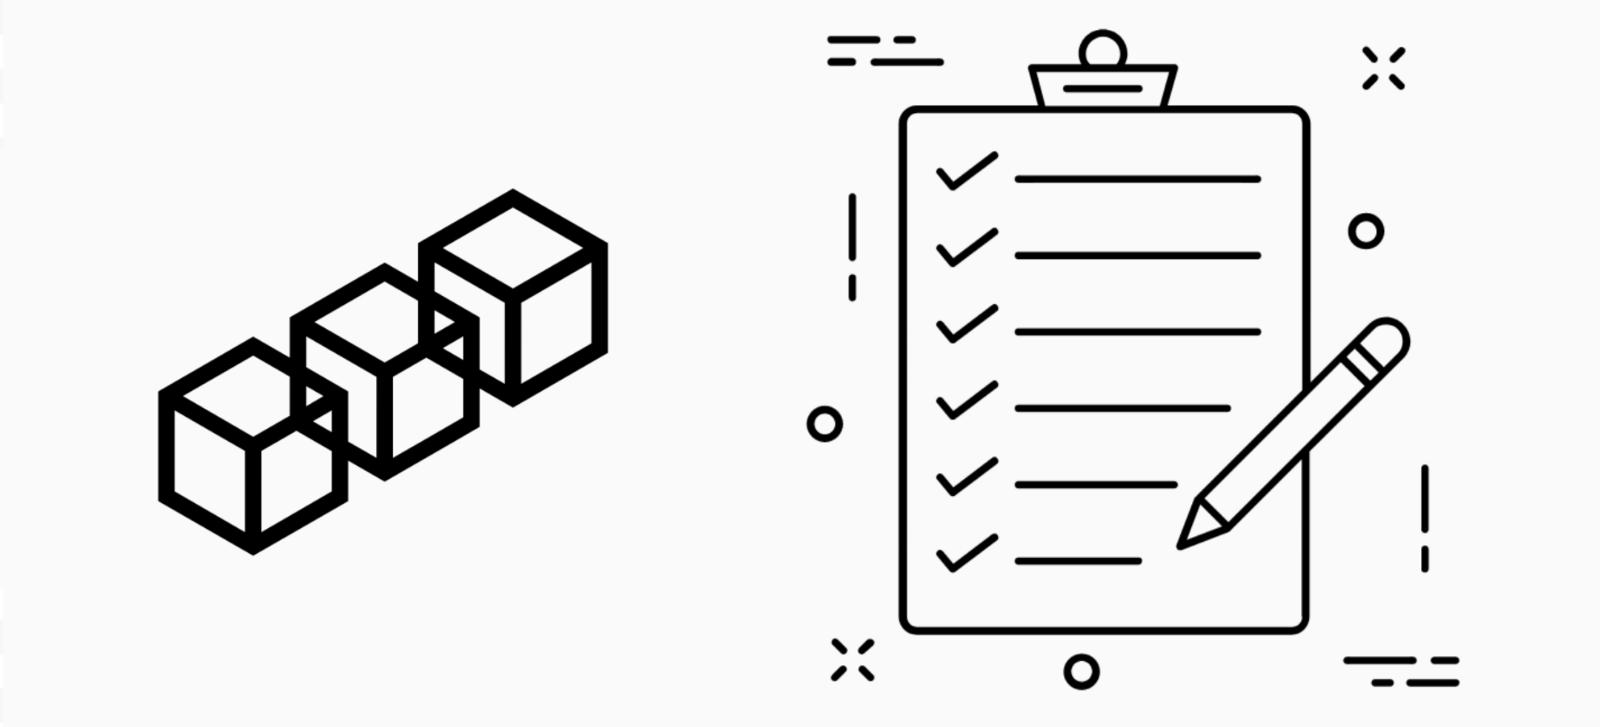 /blockchain-usability-checklist-5c5e1409183d feature image